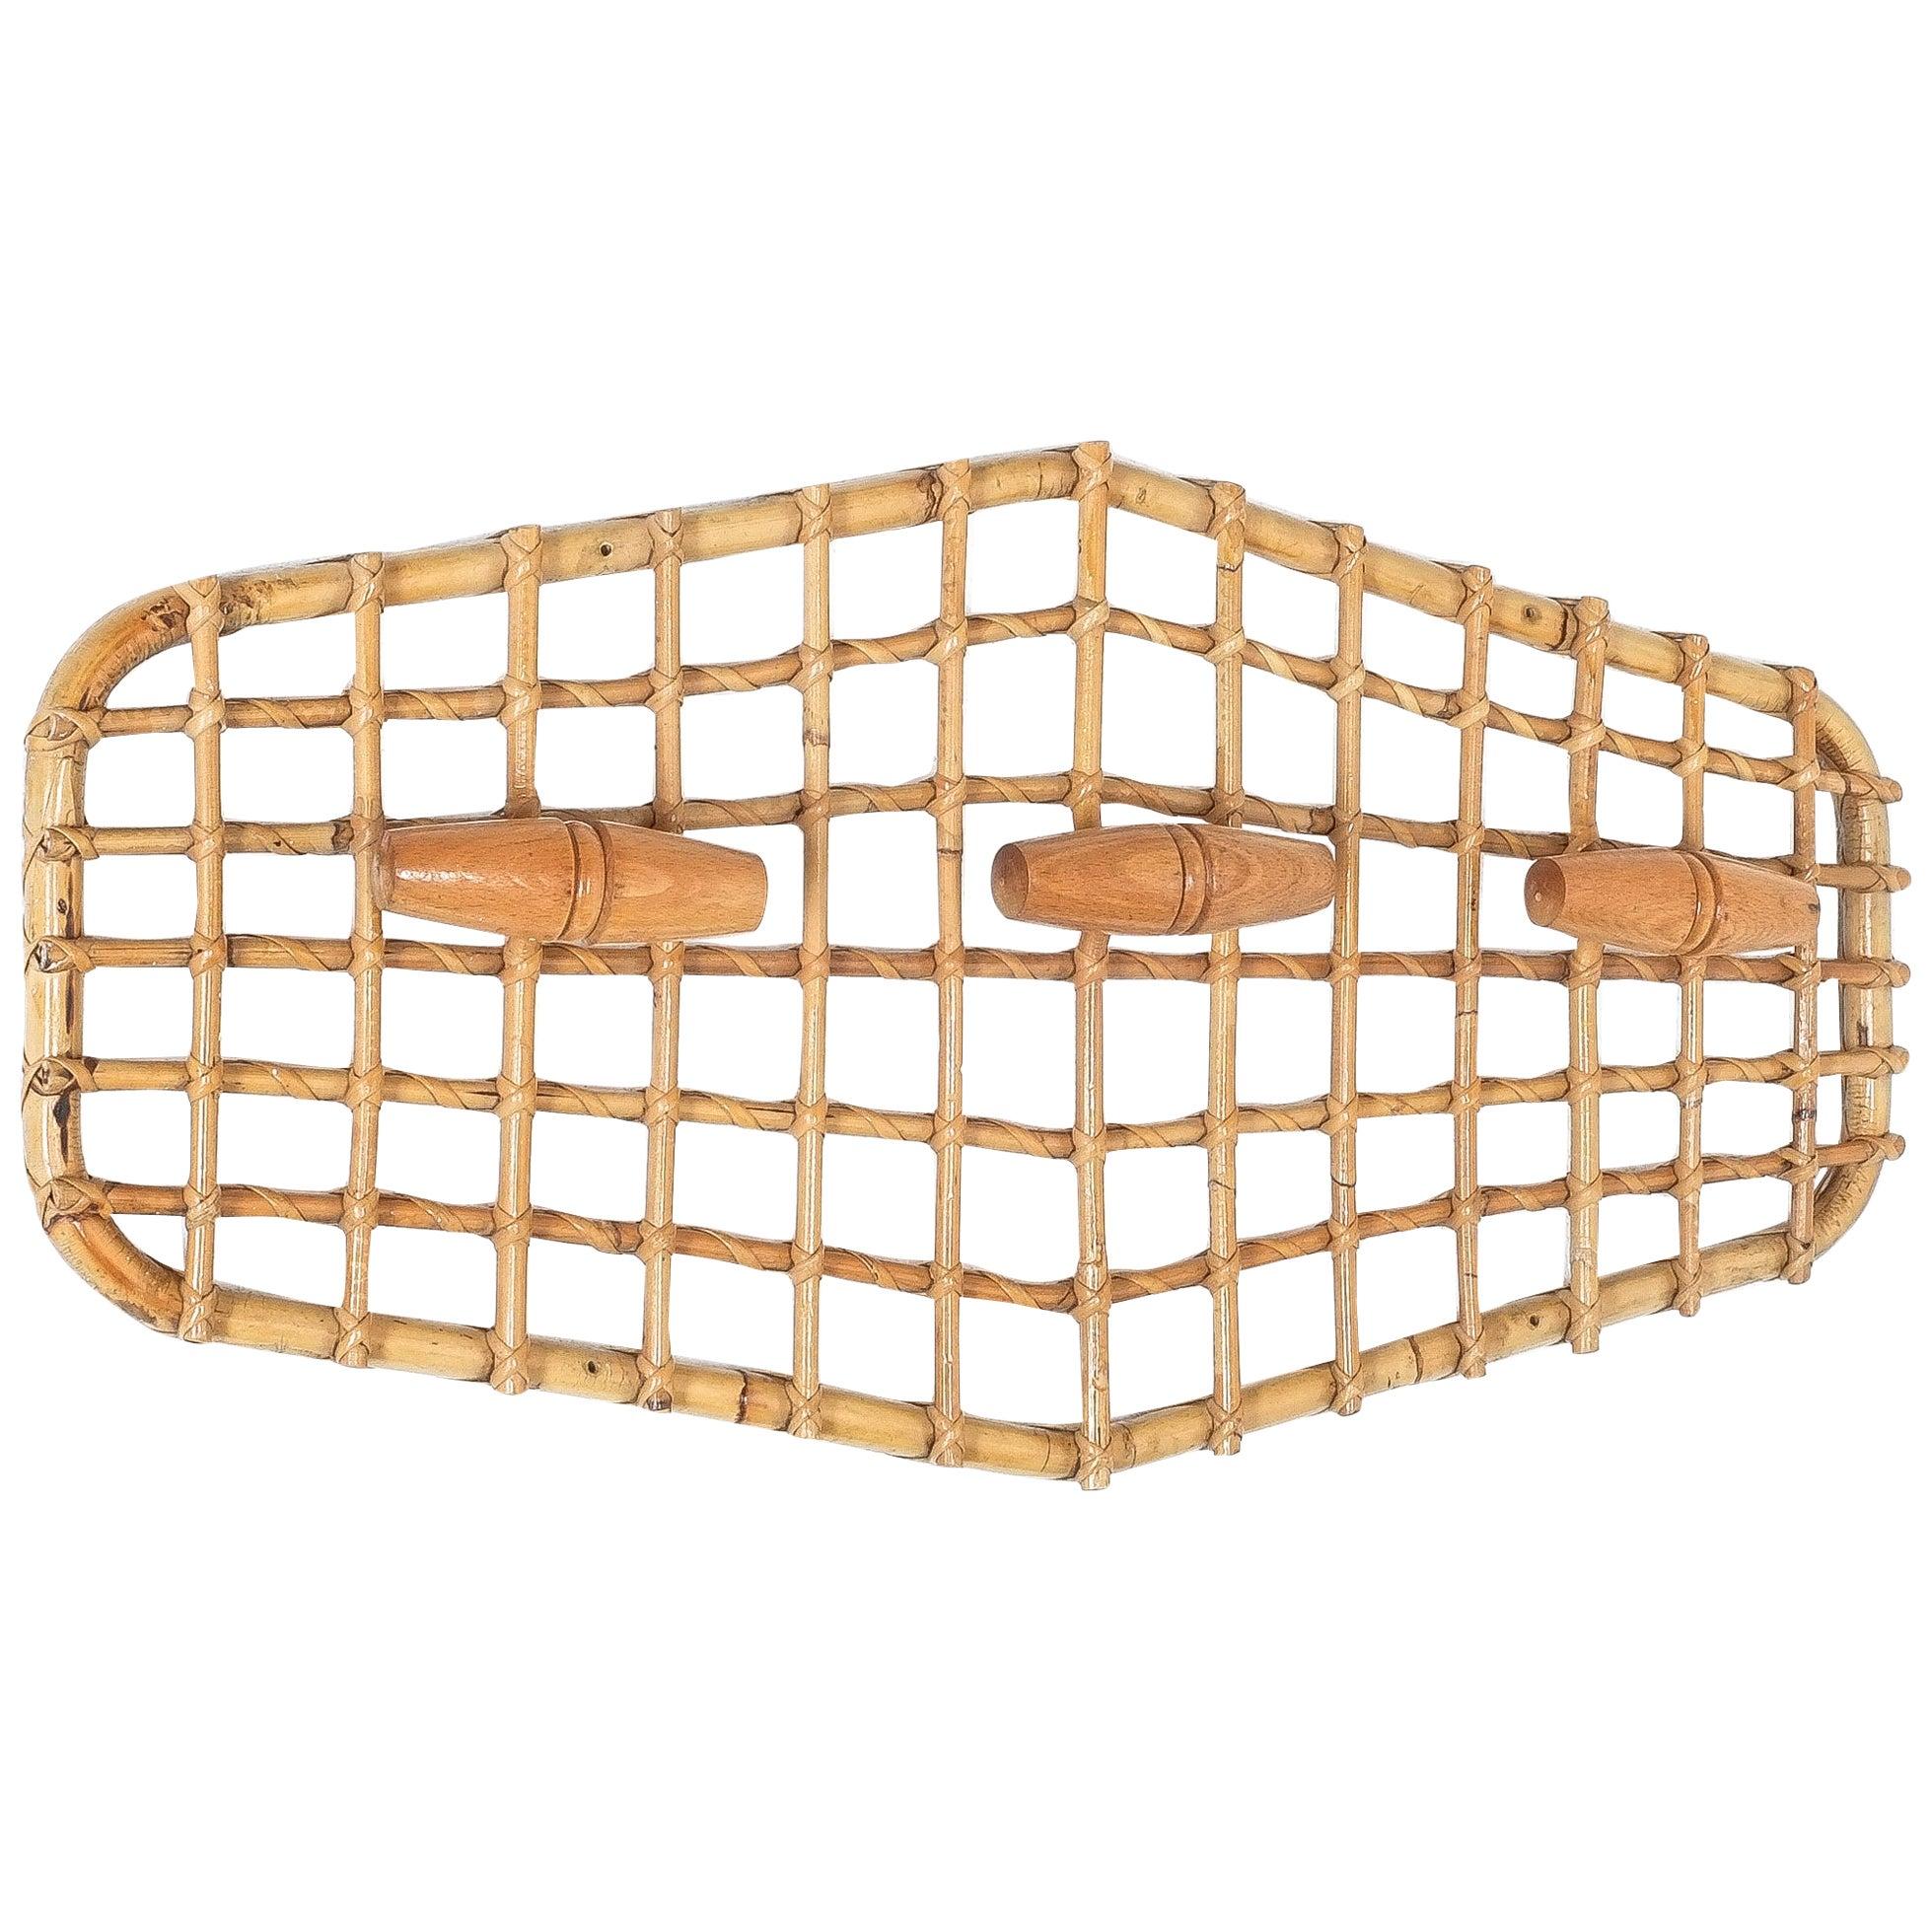 Bamboo Coatrack by Olaf von Bohr, Italy Midcentury